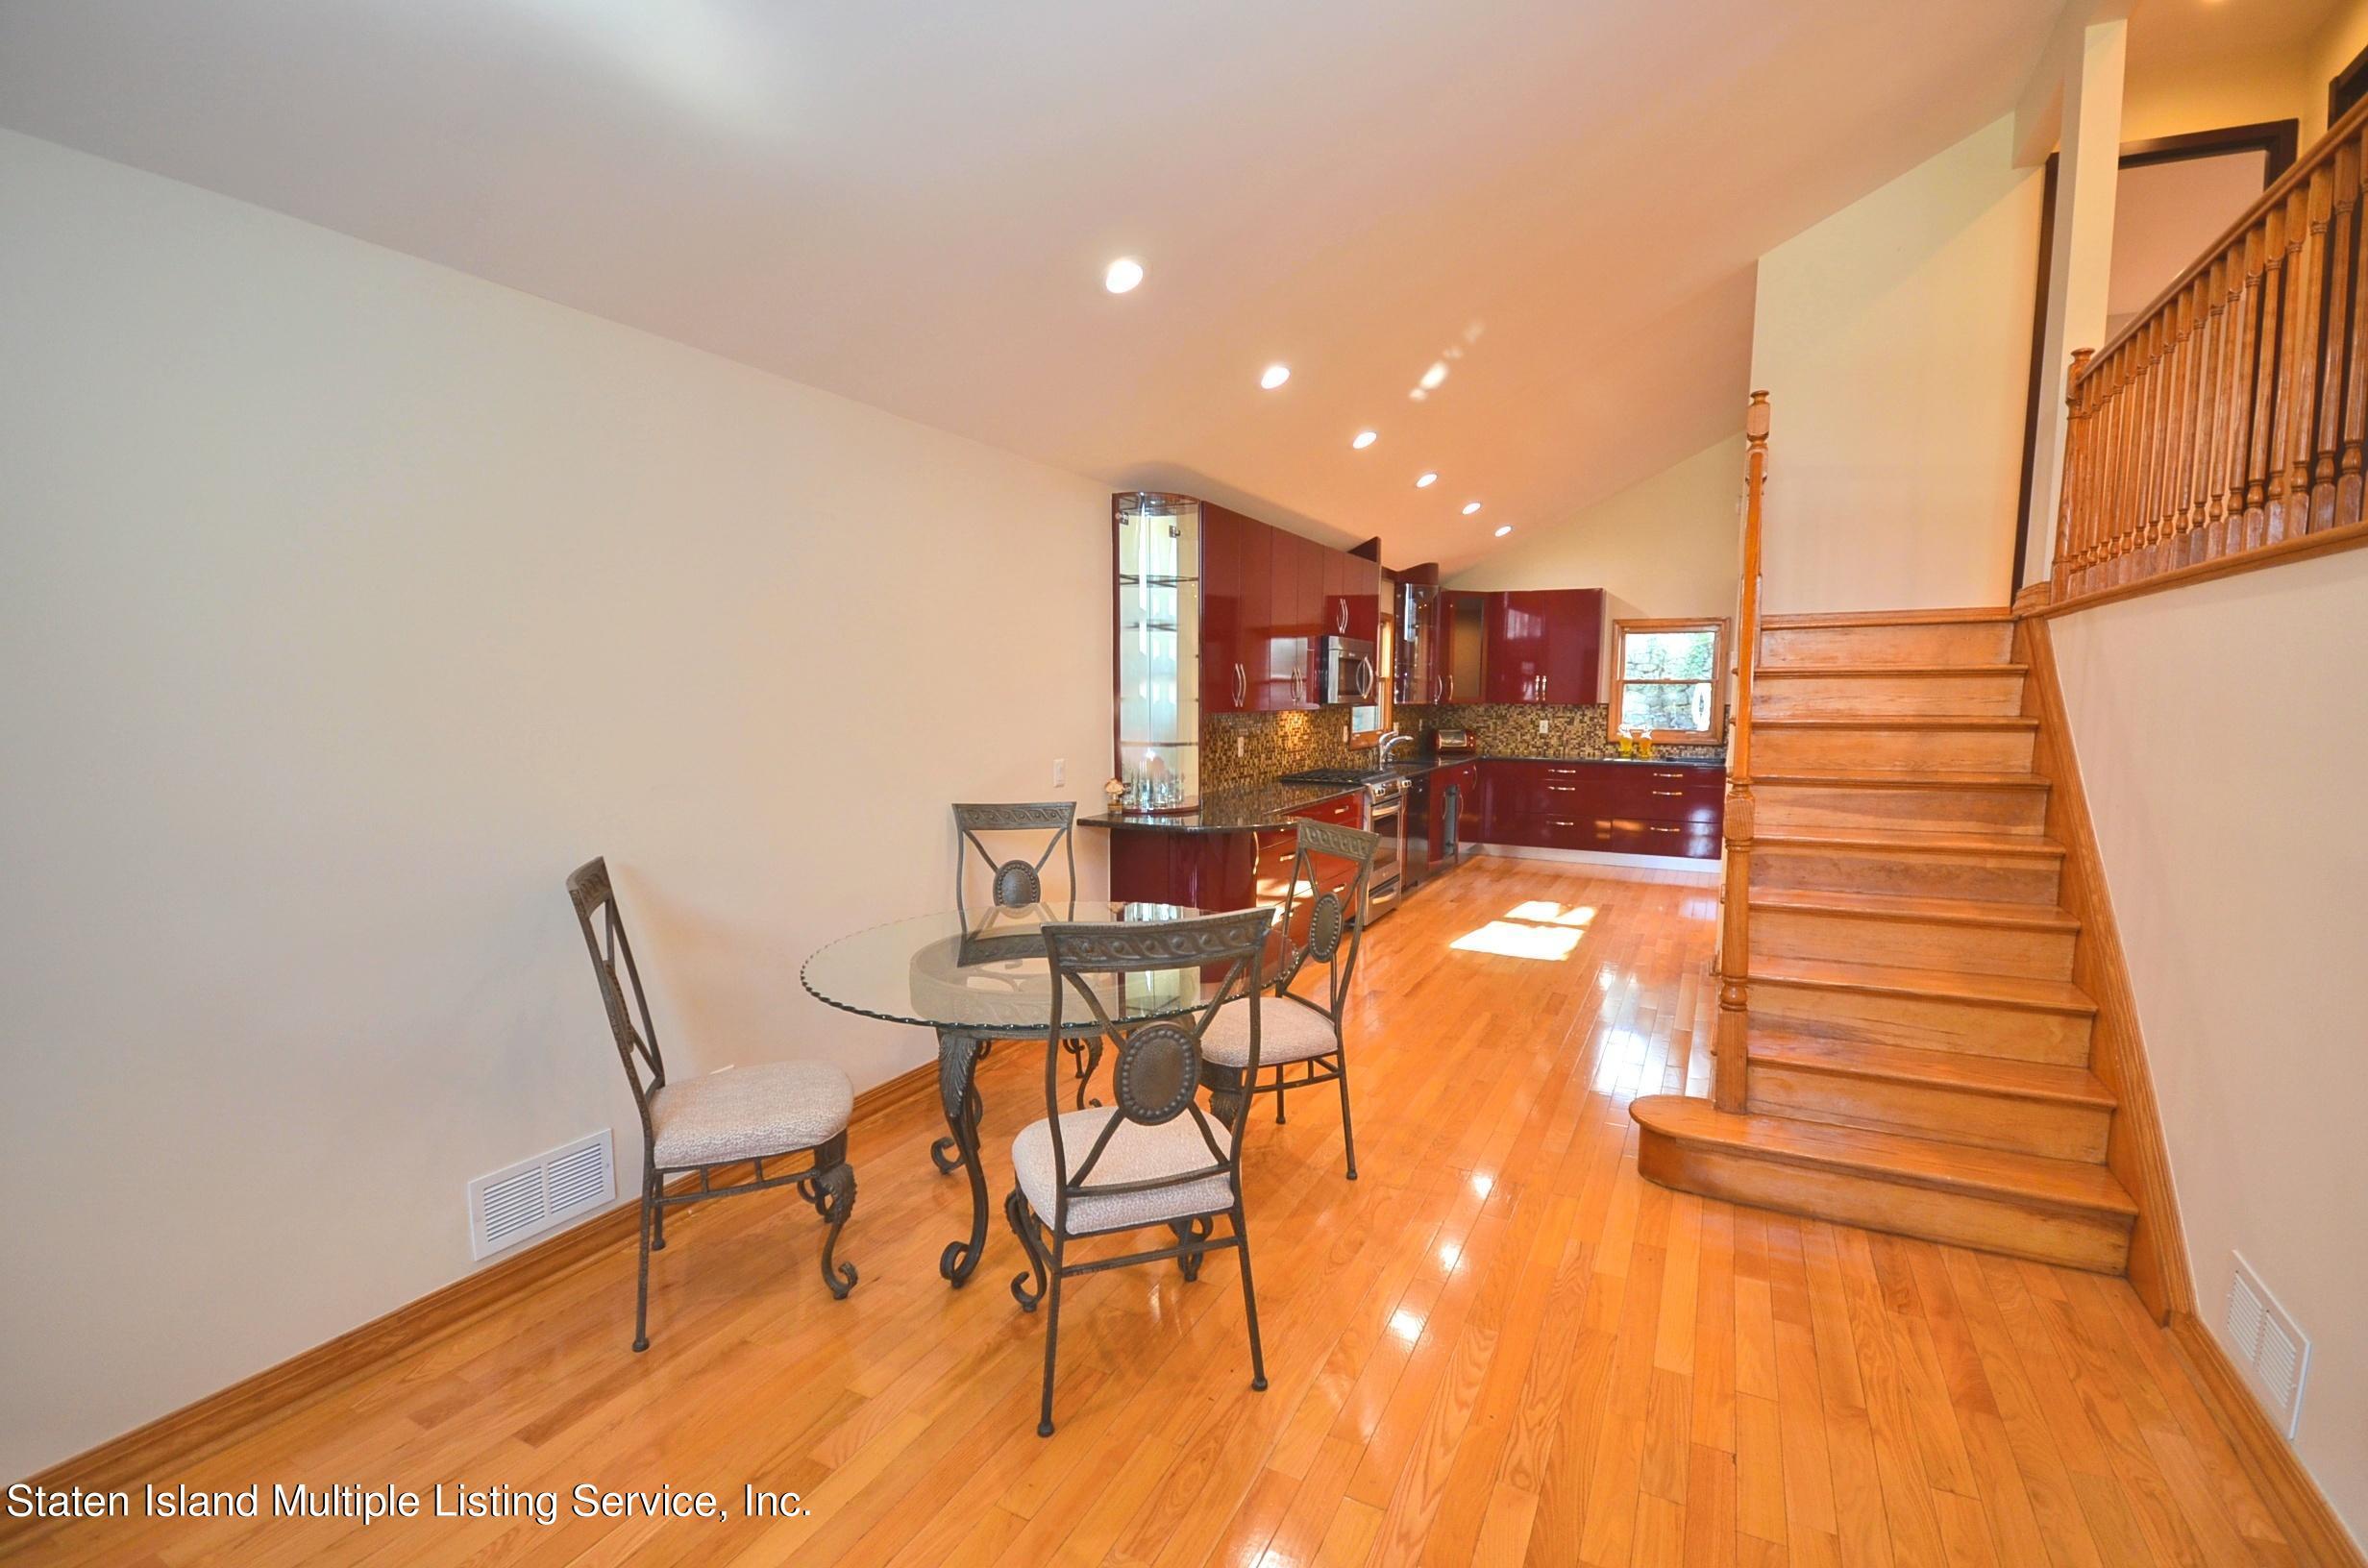 Single Family - Detached 48 Ocean Terrace  Staten Island, NY 10314, MLS-1142240-10